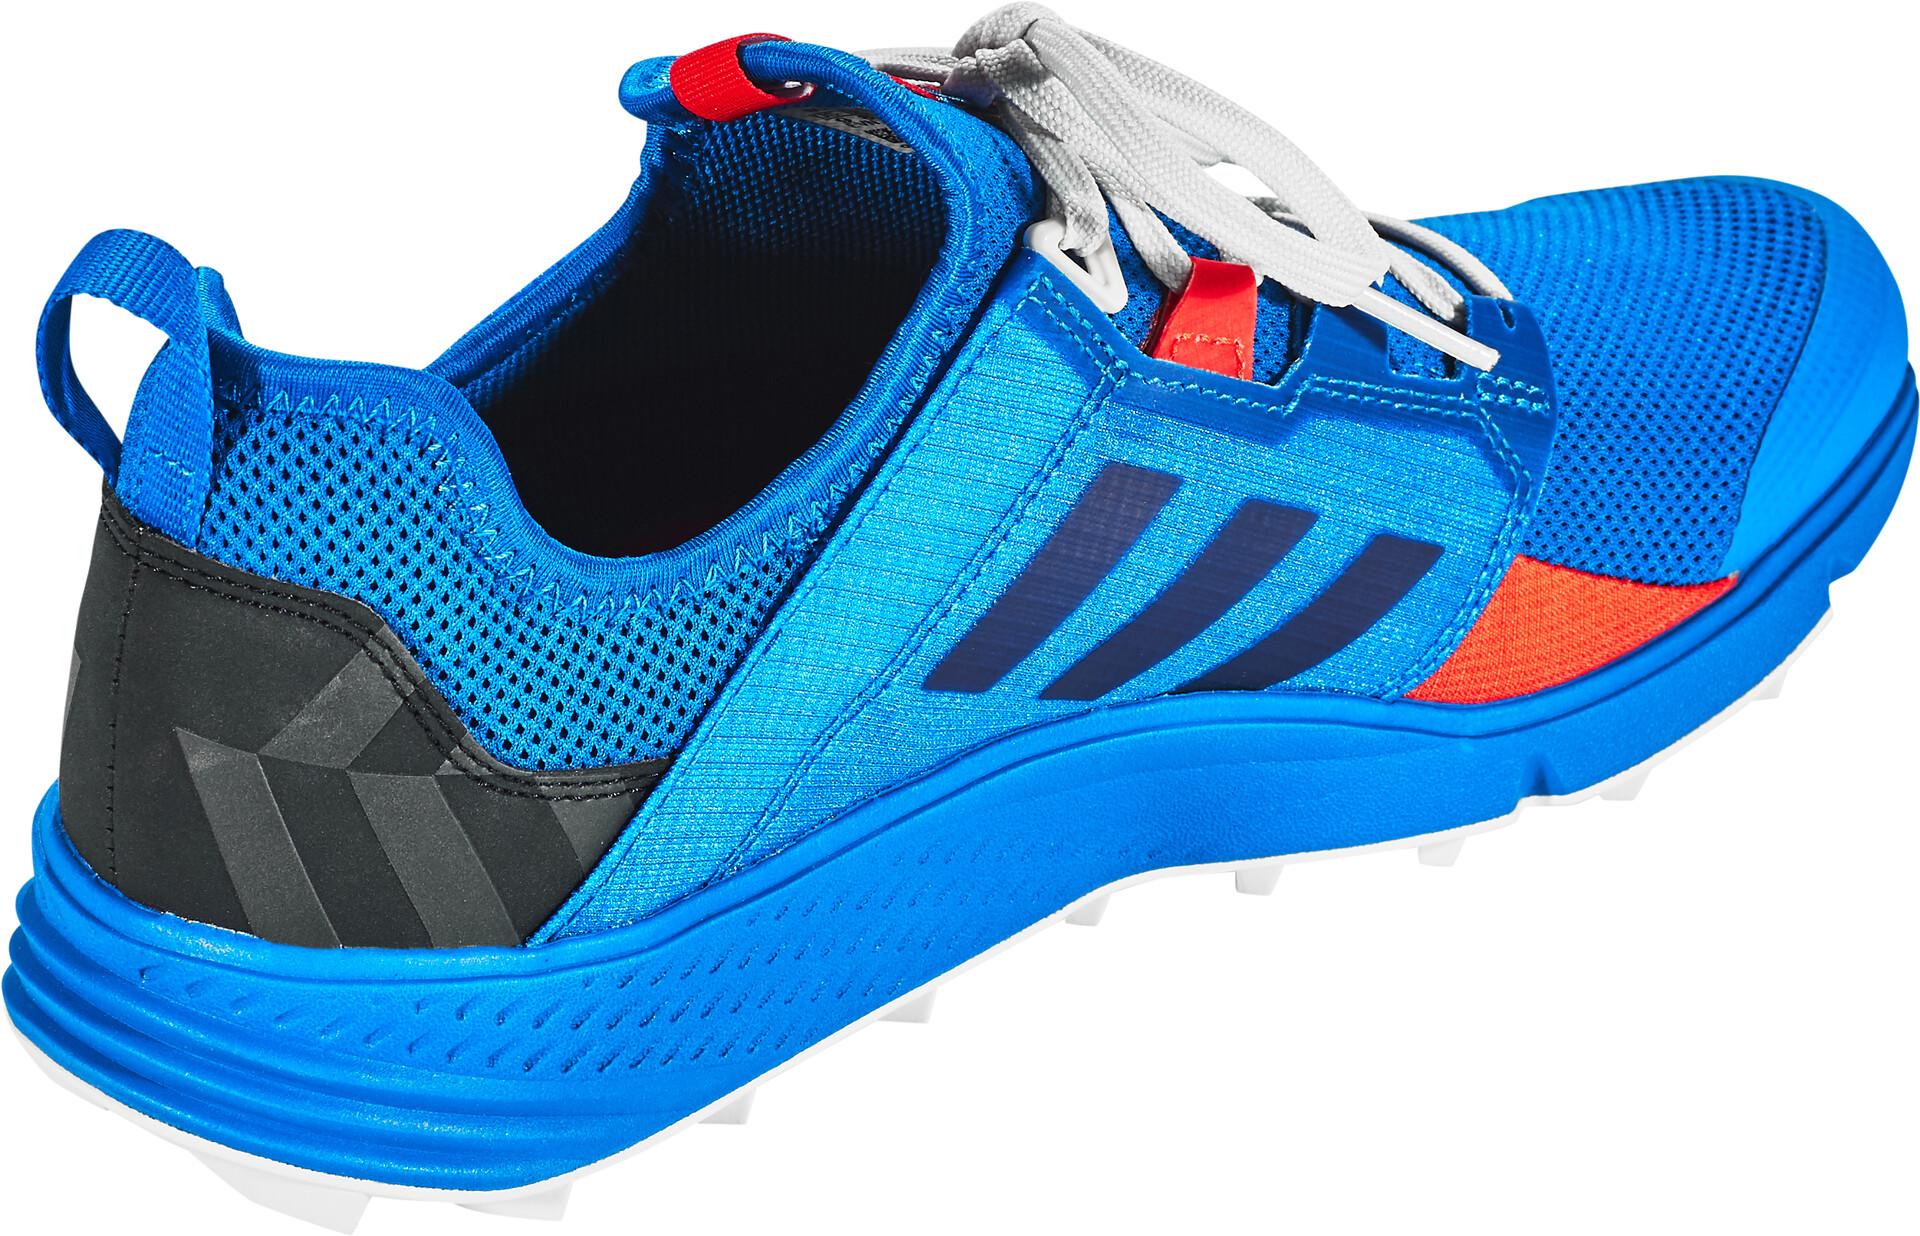 adidas TERREX Speed LD Shoes Men blue beautylegend inkactive red